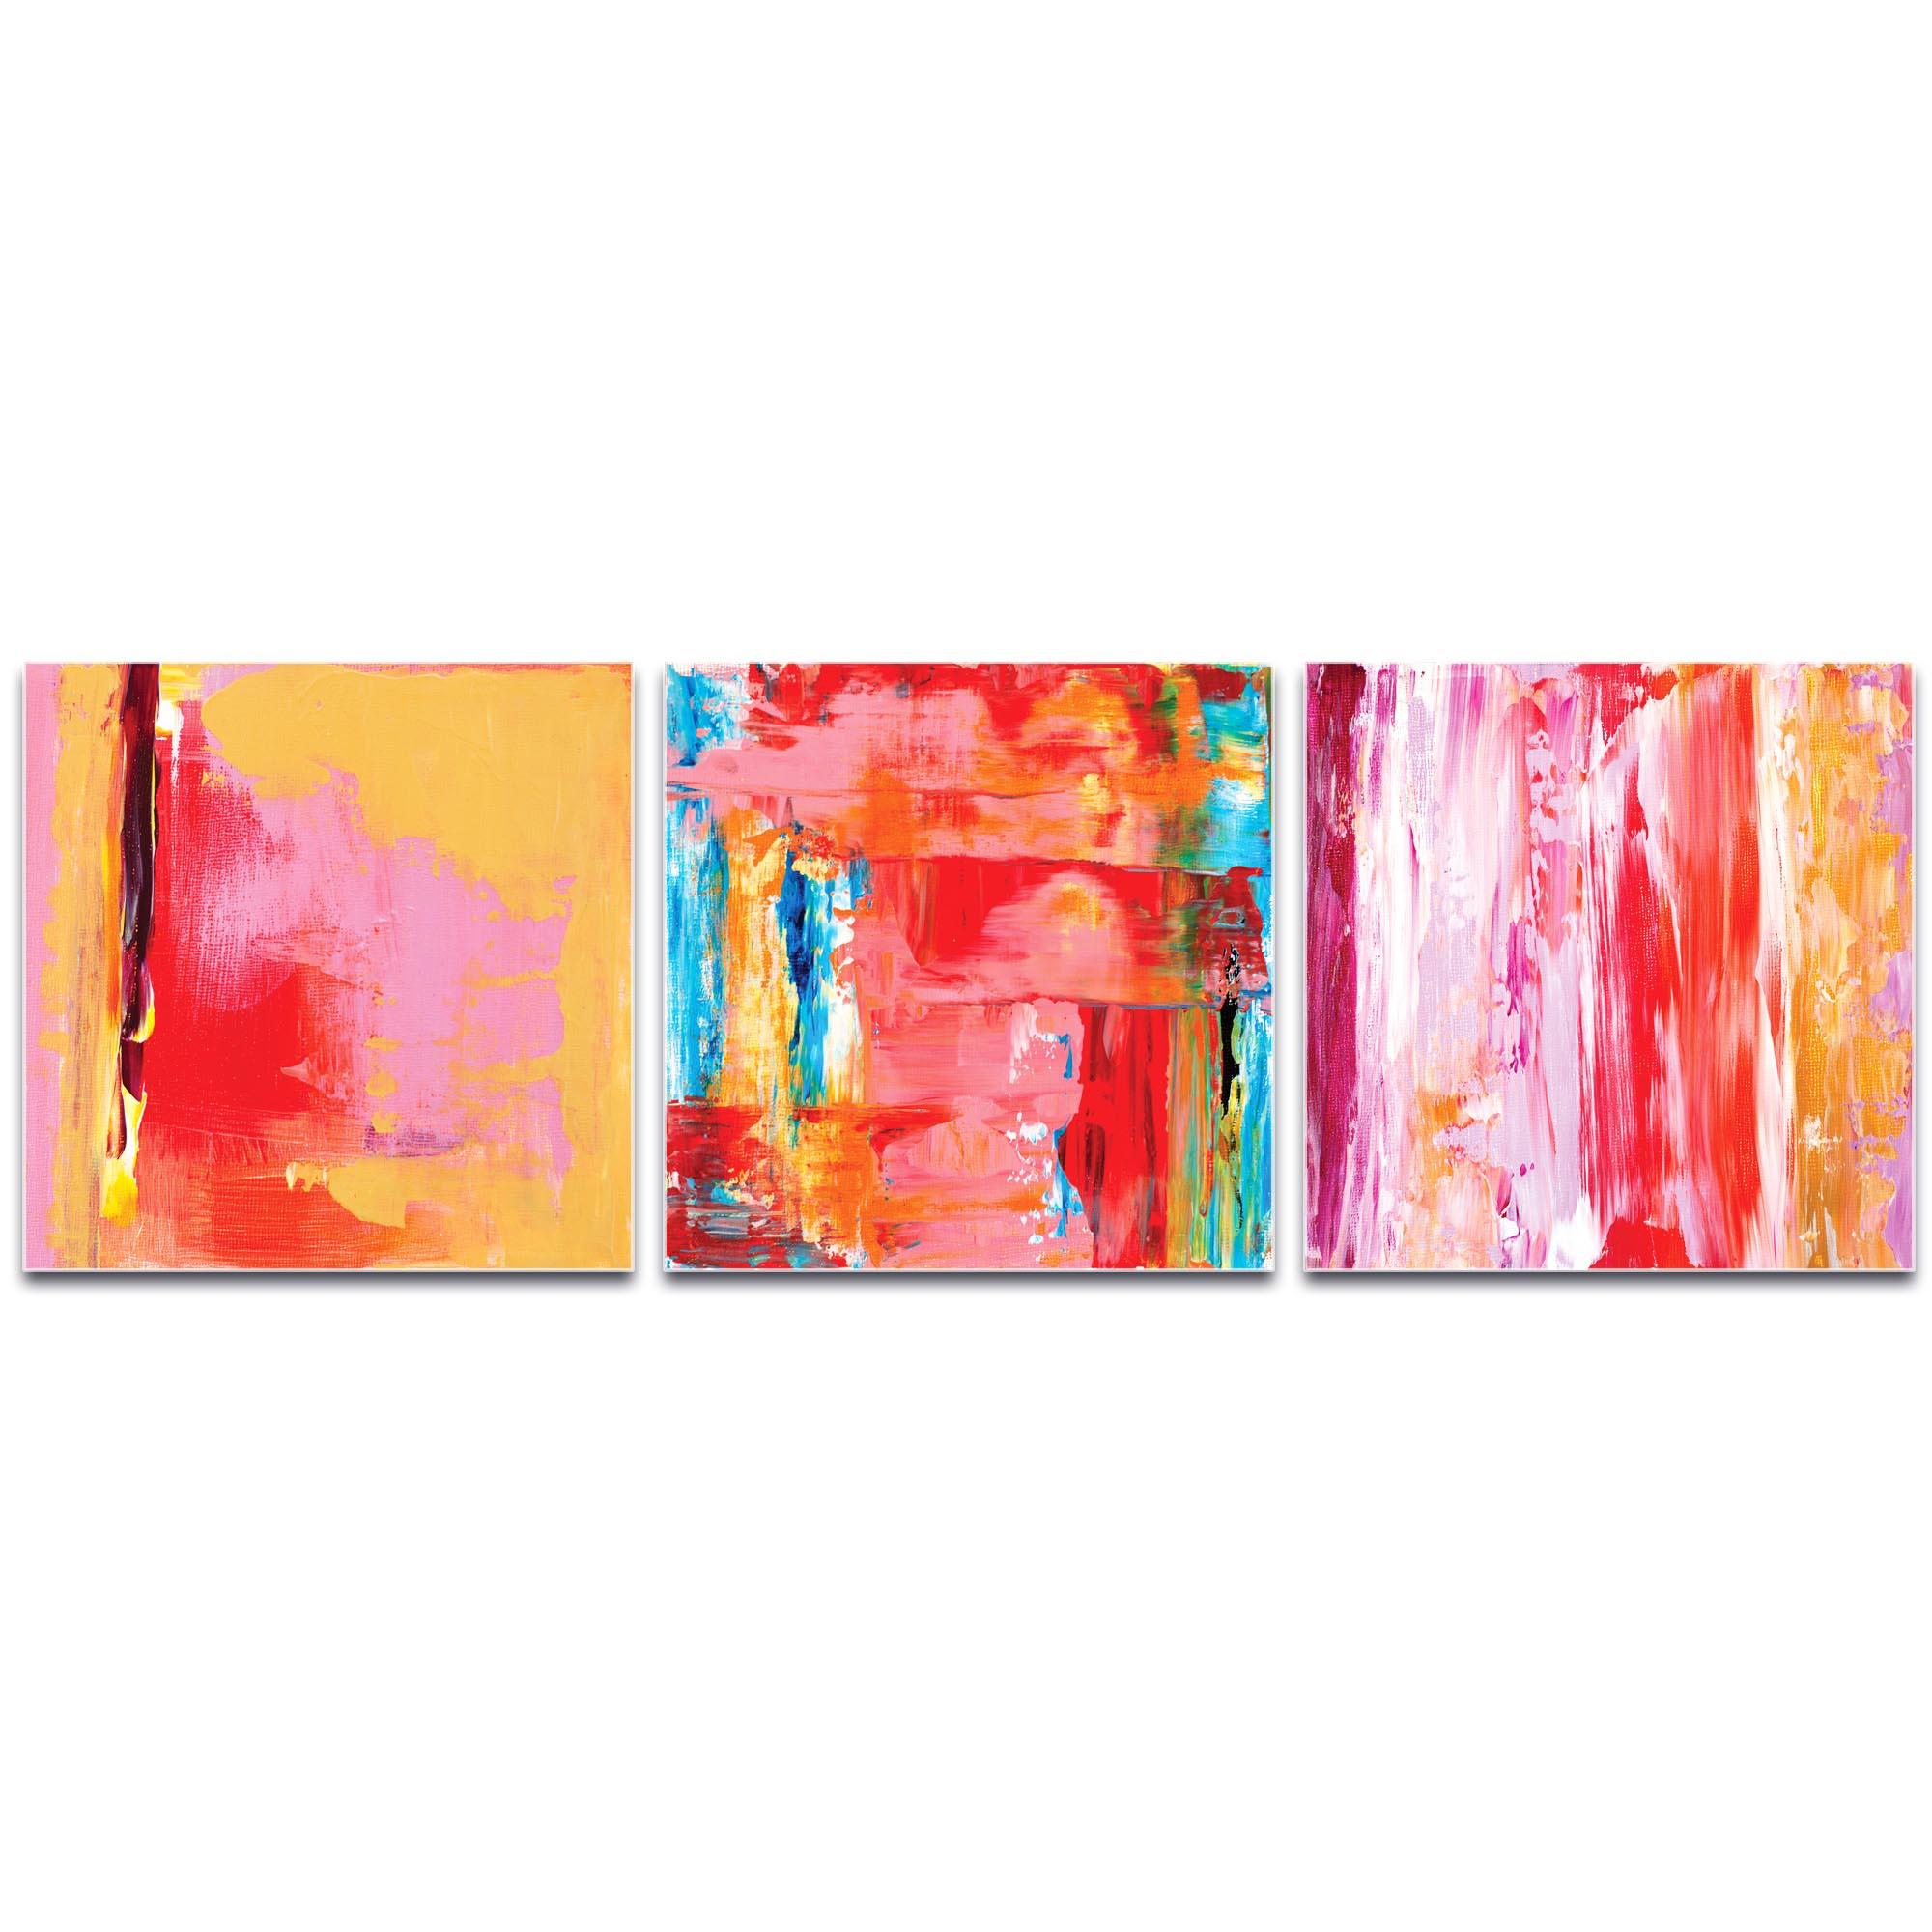 Abstract Wall Art 'Urban Triptych 3' - Urban Decor on Metal or Plexiglass - Image 2